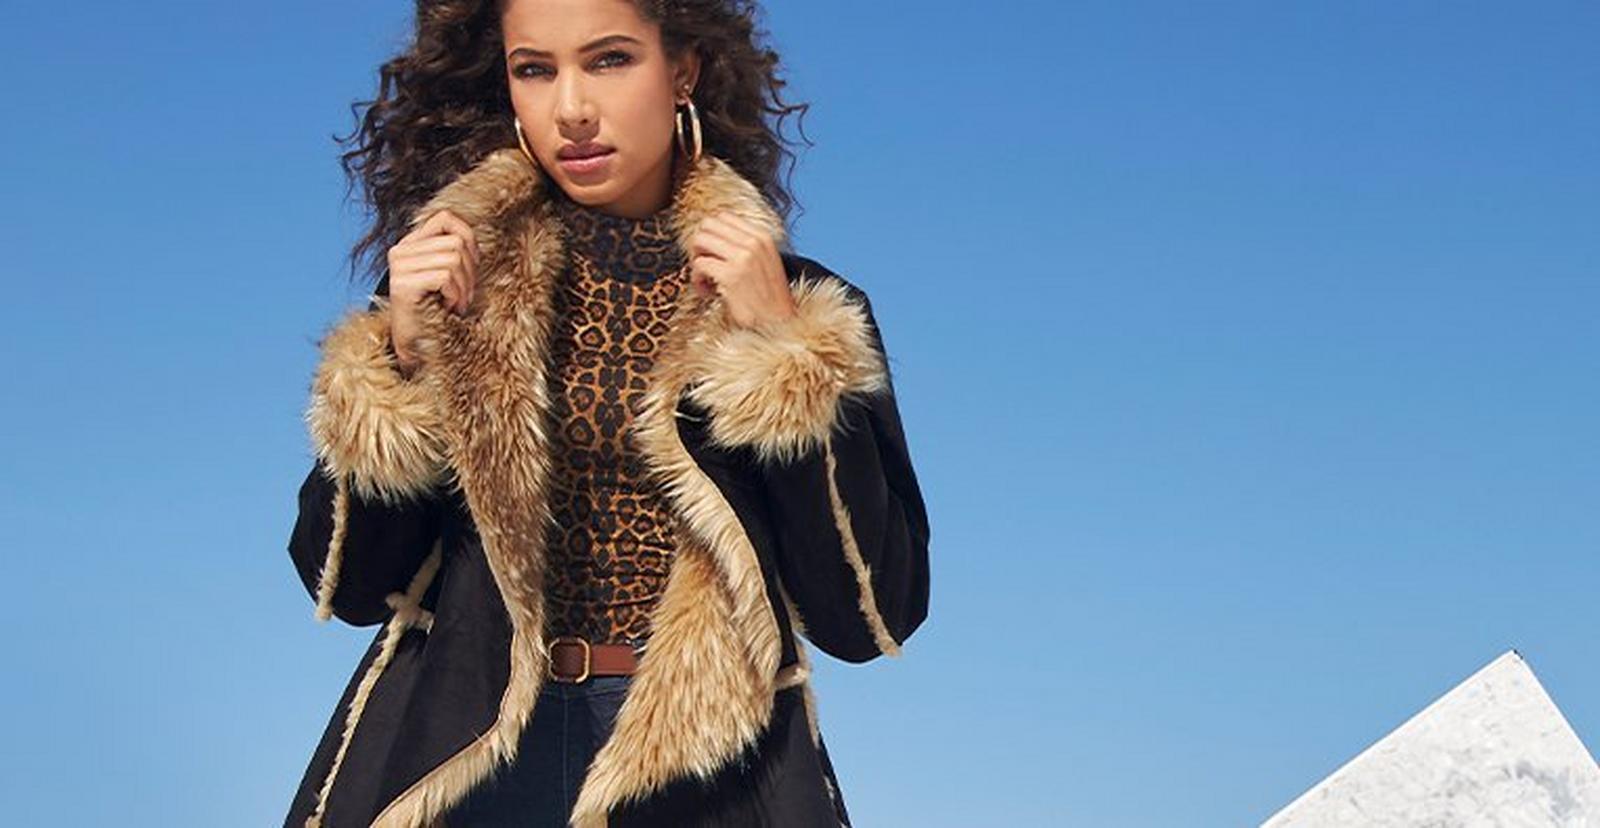 model wearing a black cascading long coat with tan faux fur, silver hoop earrings, and brown animal print turtleneck top.